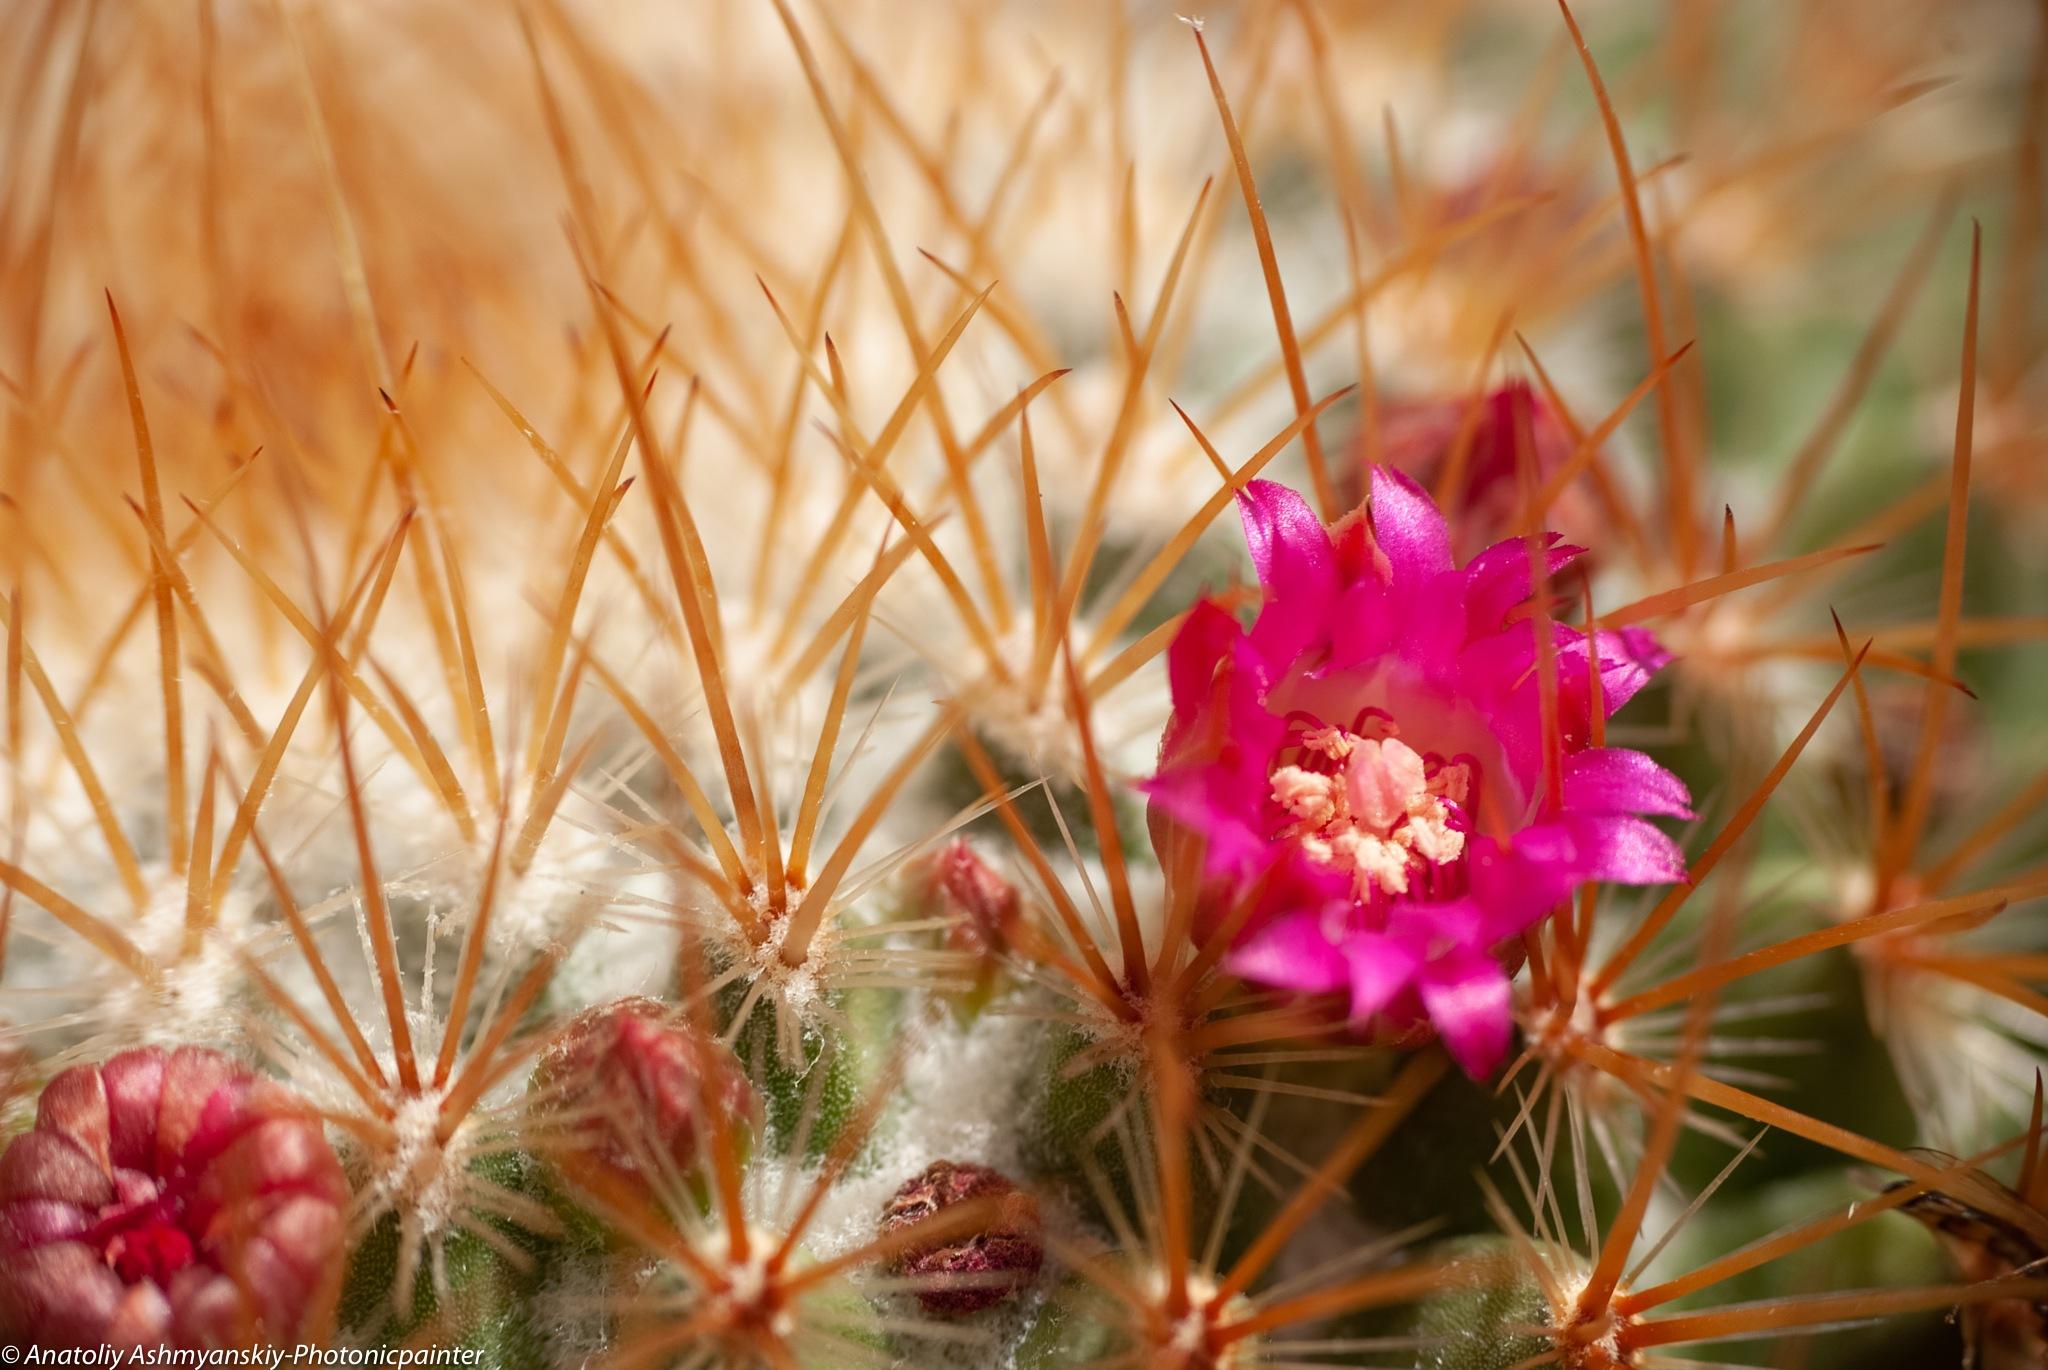 Small flower of mamillaria cactus by Anatoliy Ashmyanskiy